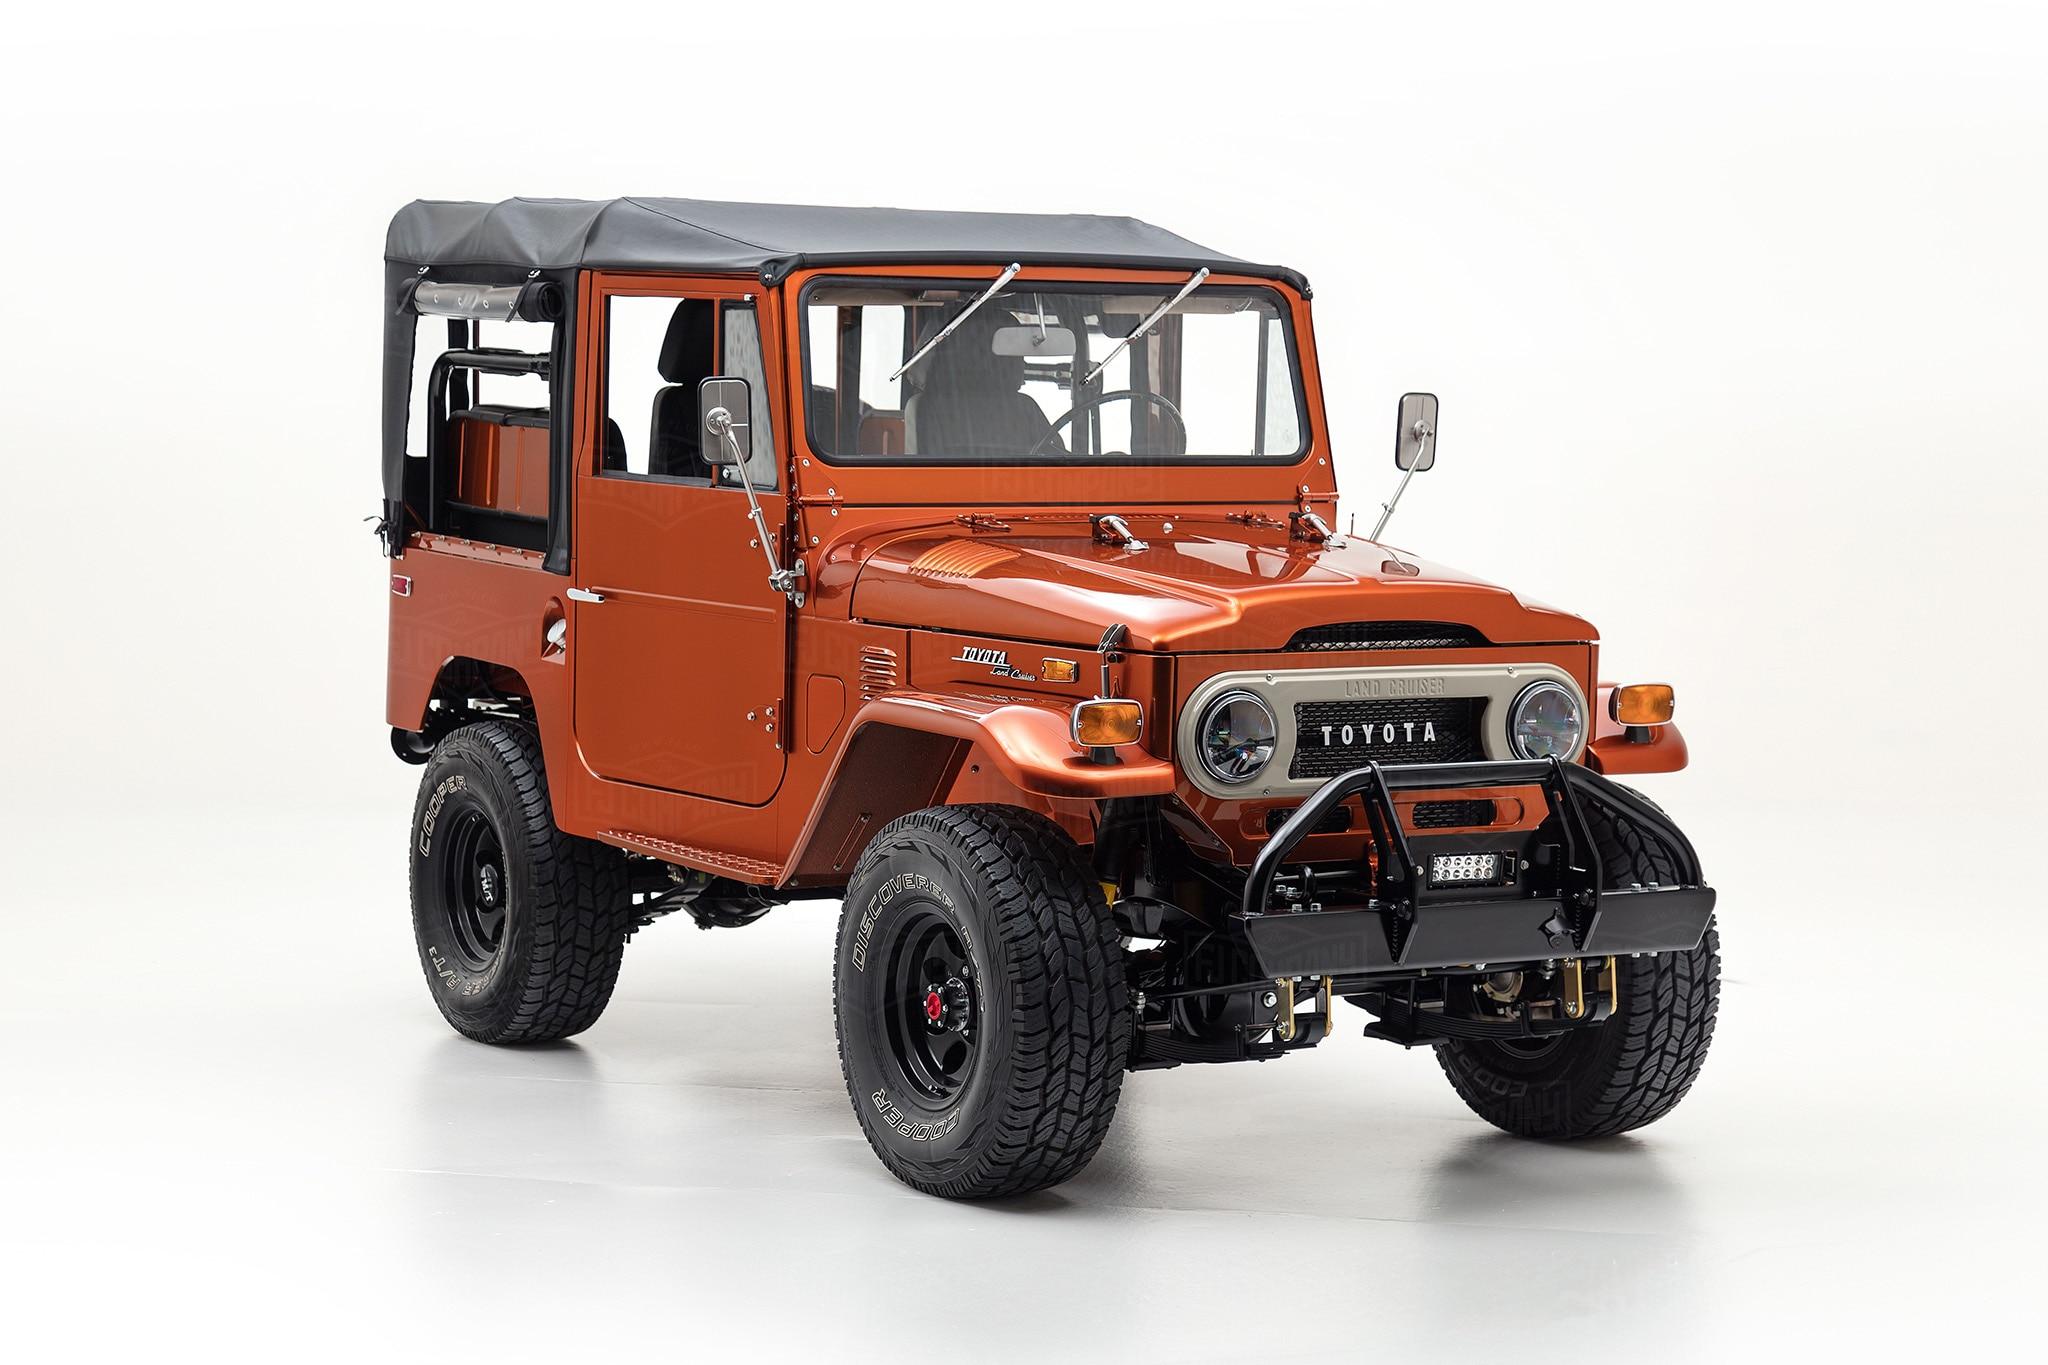 FJ Company Builds A 1972 Toyota FJ40 Land Cruiser Inspired By Tonka Truck